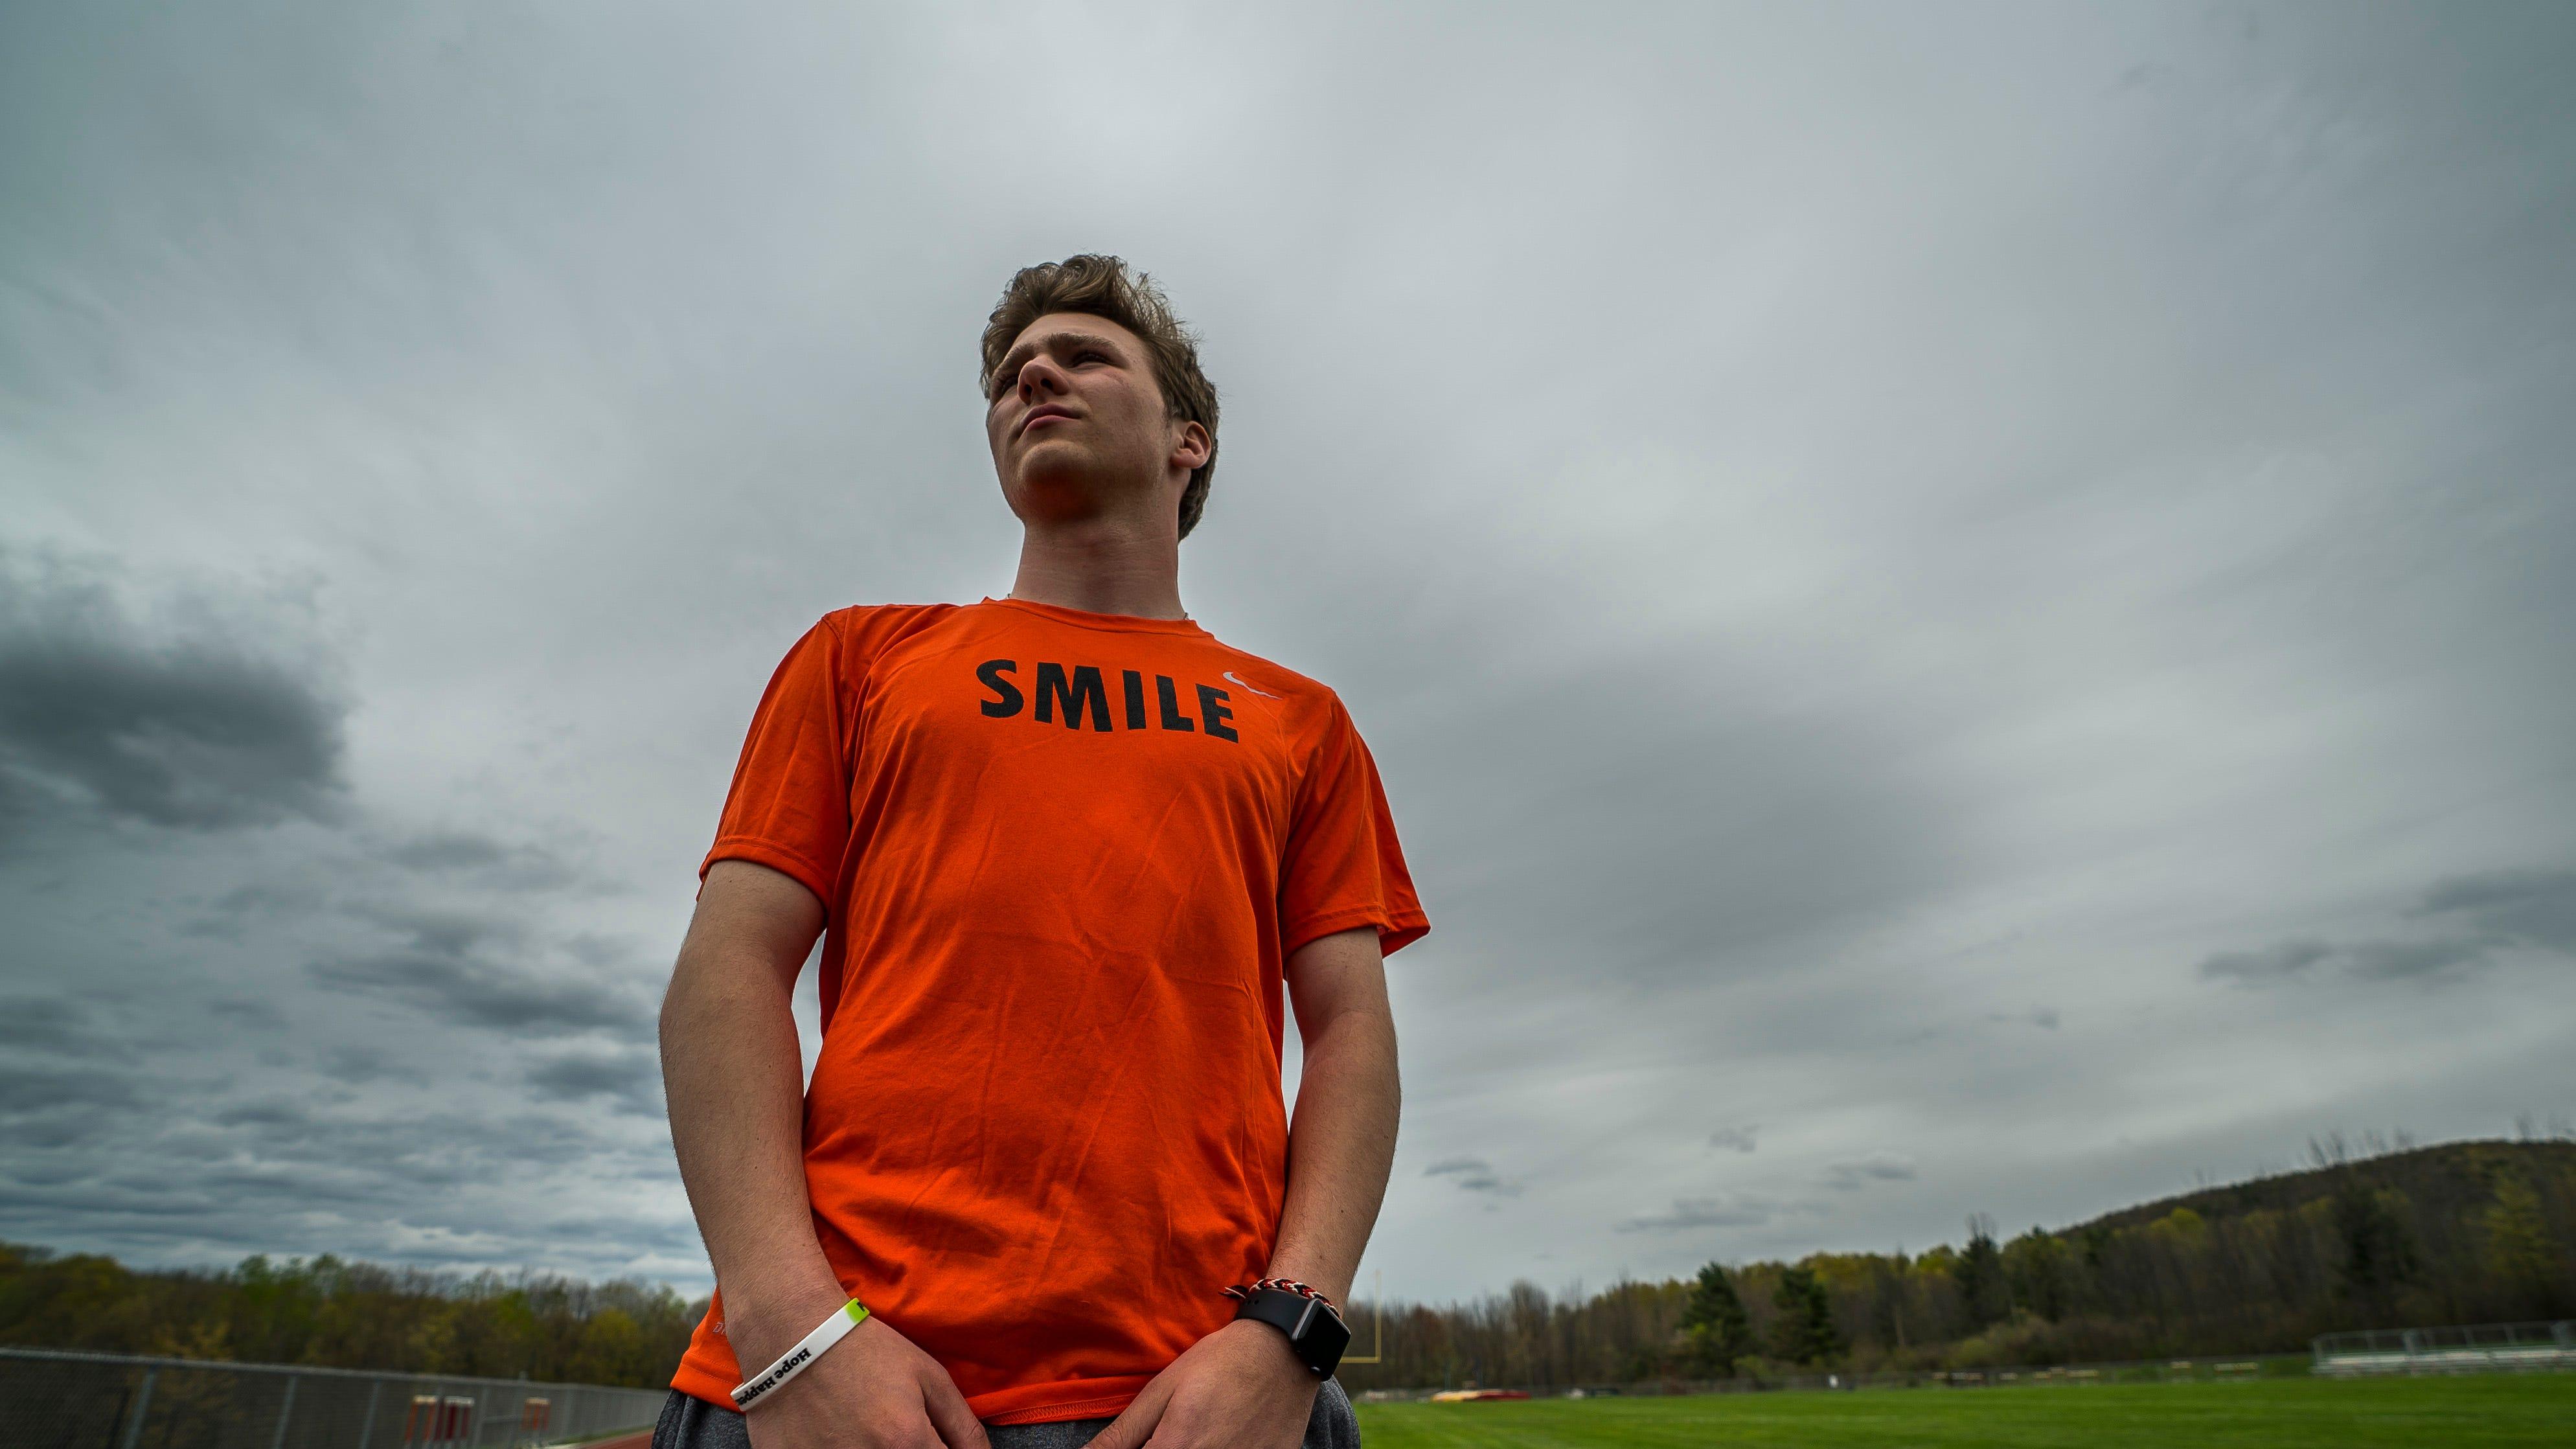 Vermont City Marathon: CVU's Tyler Skaflestad running for teen suicide awareness